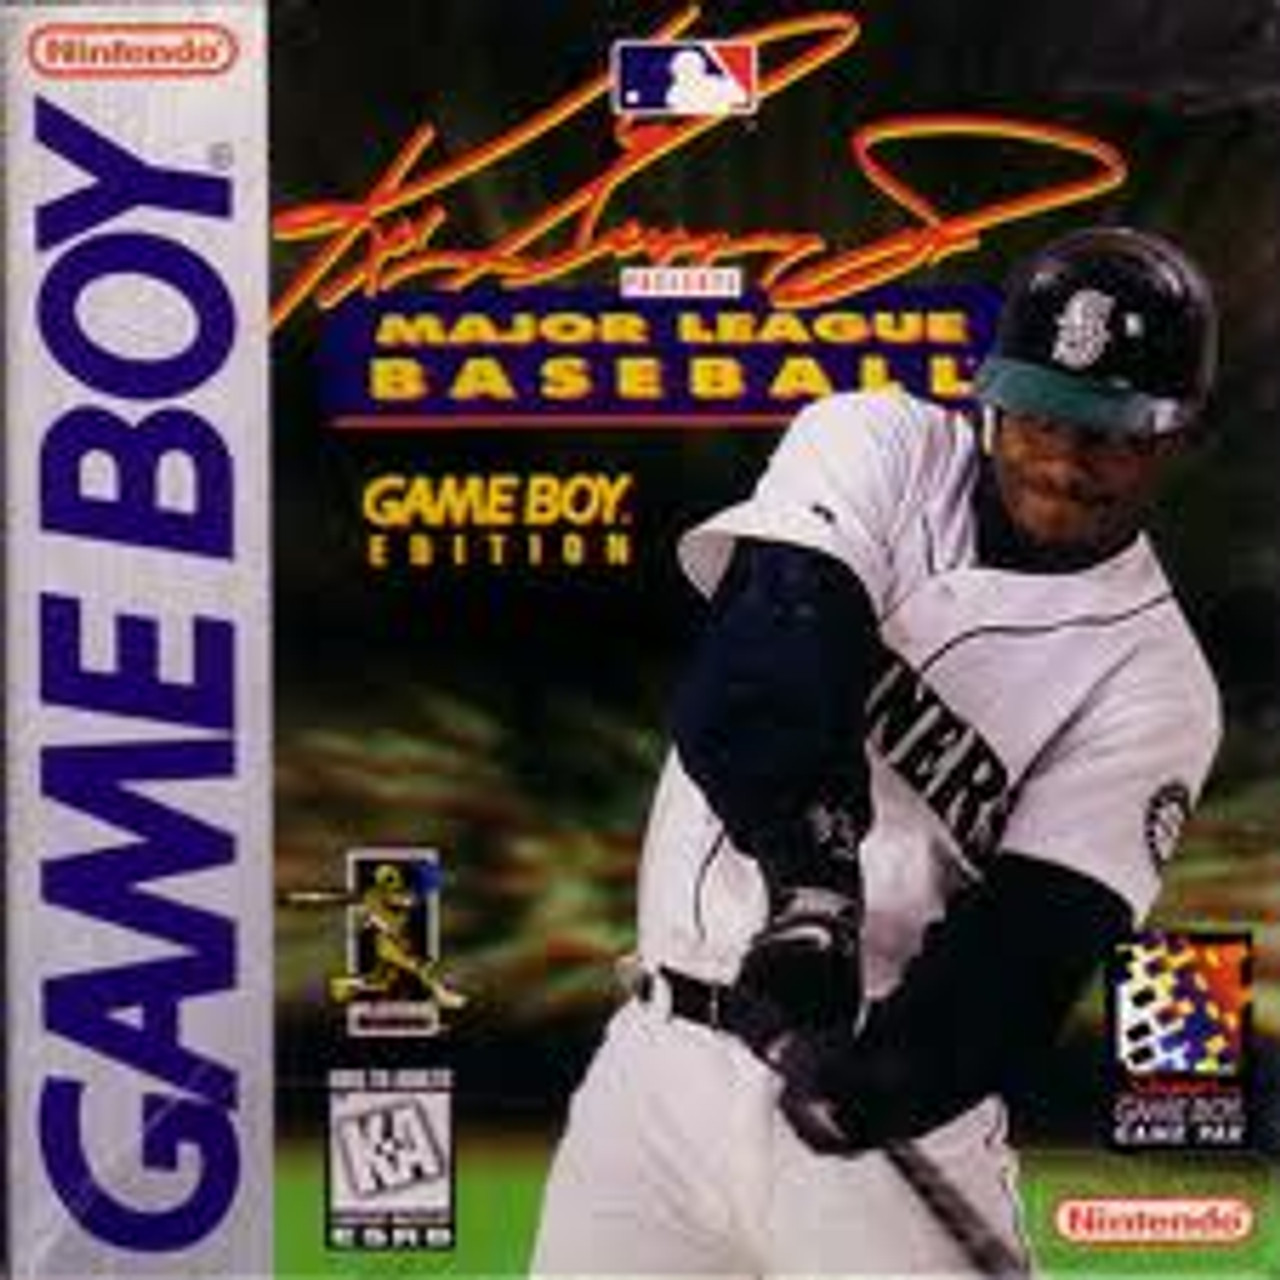 eb2ecc0a89 Ken Griffey Jr Presents Major League Baseball GameBoy Game For Sale